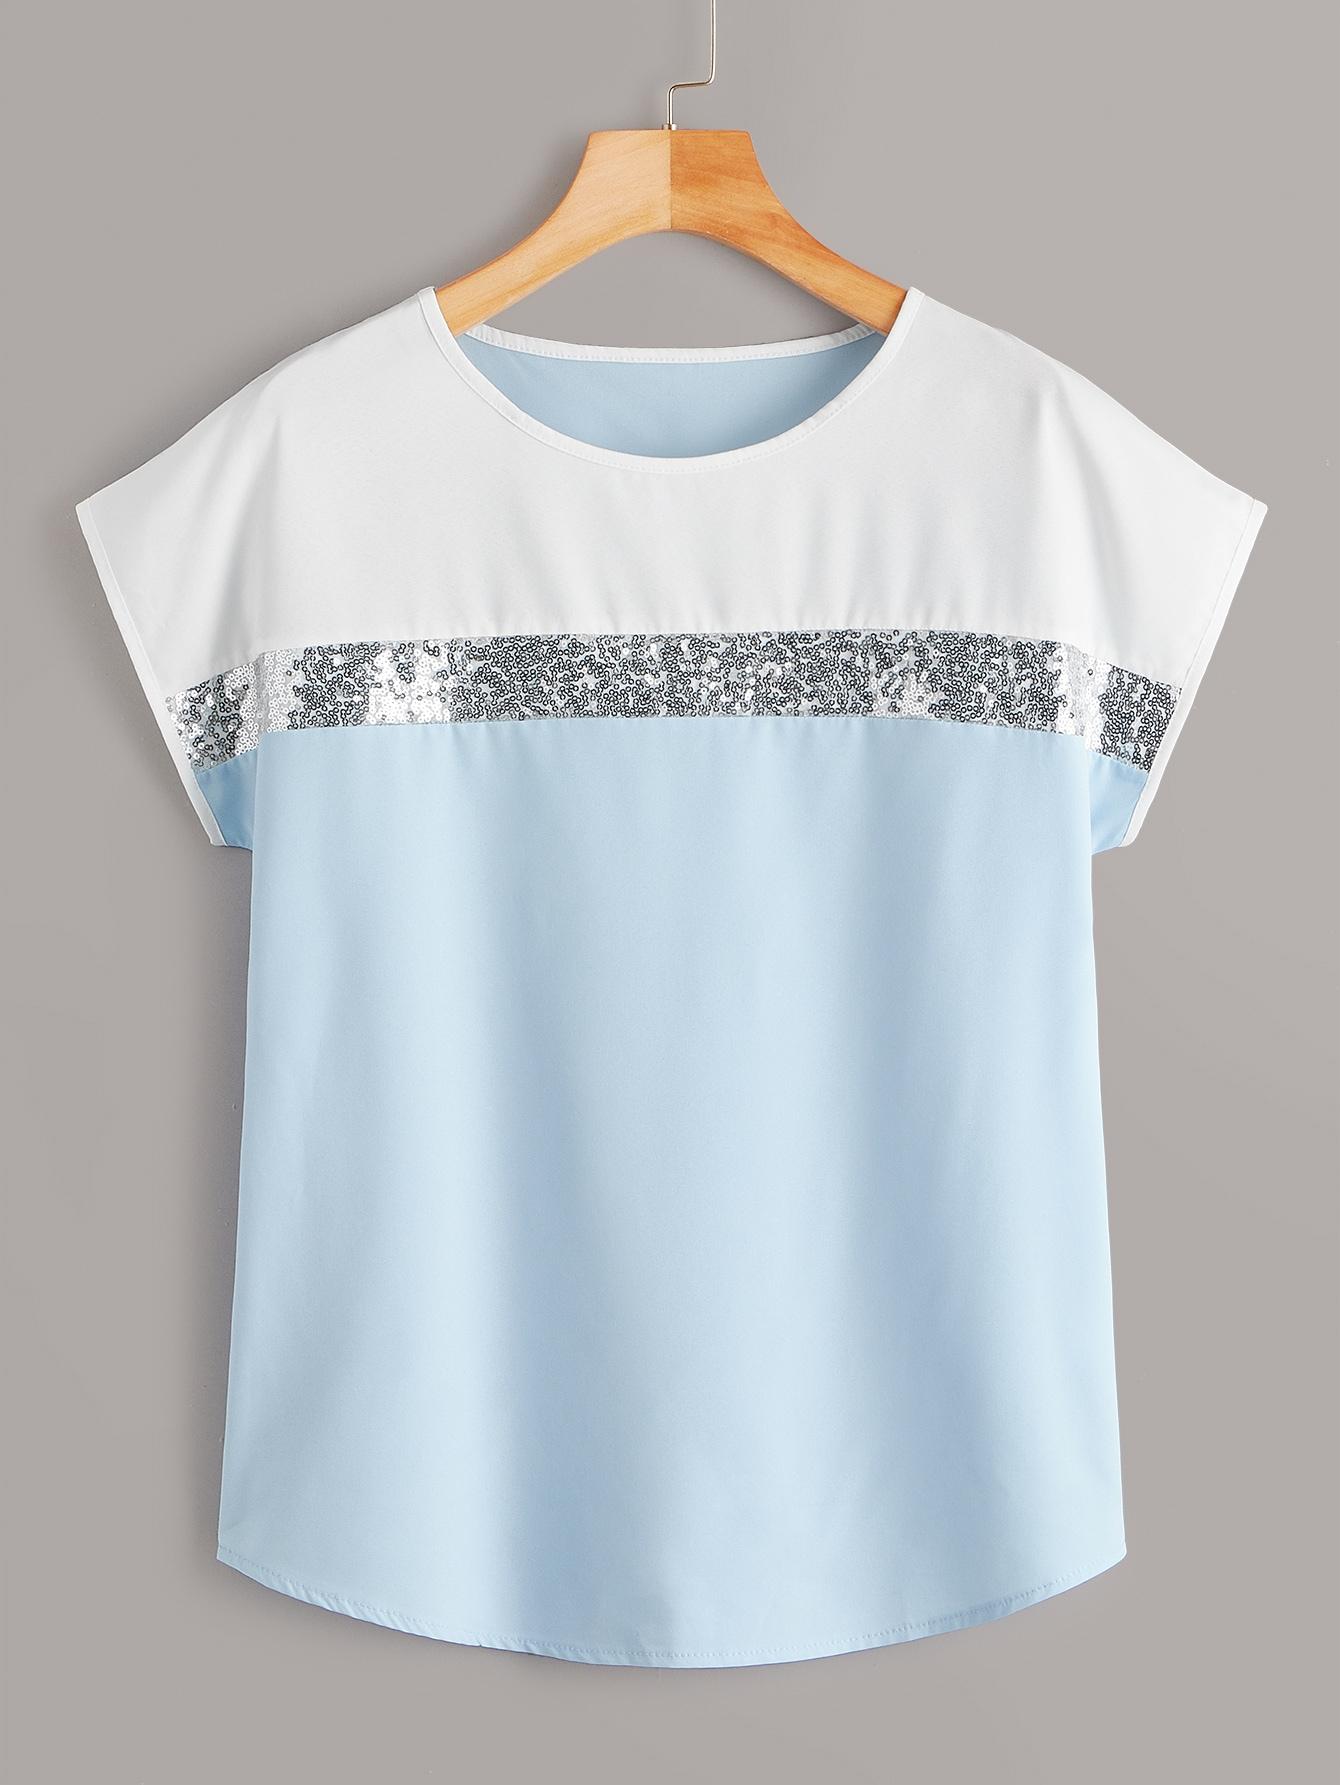 Фото - Контрастная блуза с блестками от SheIn цвет многоцветный